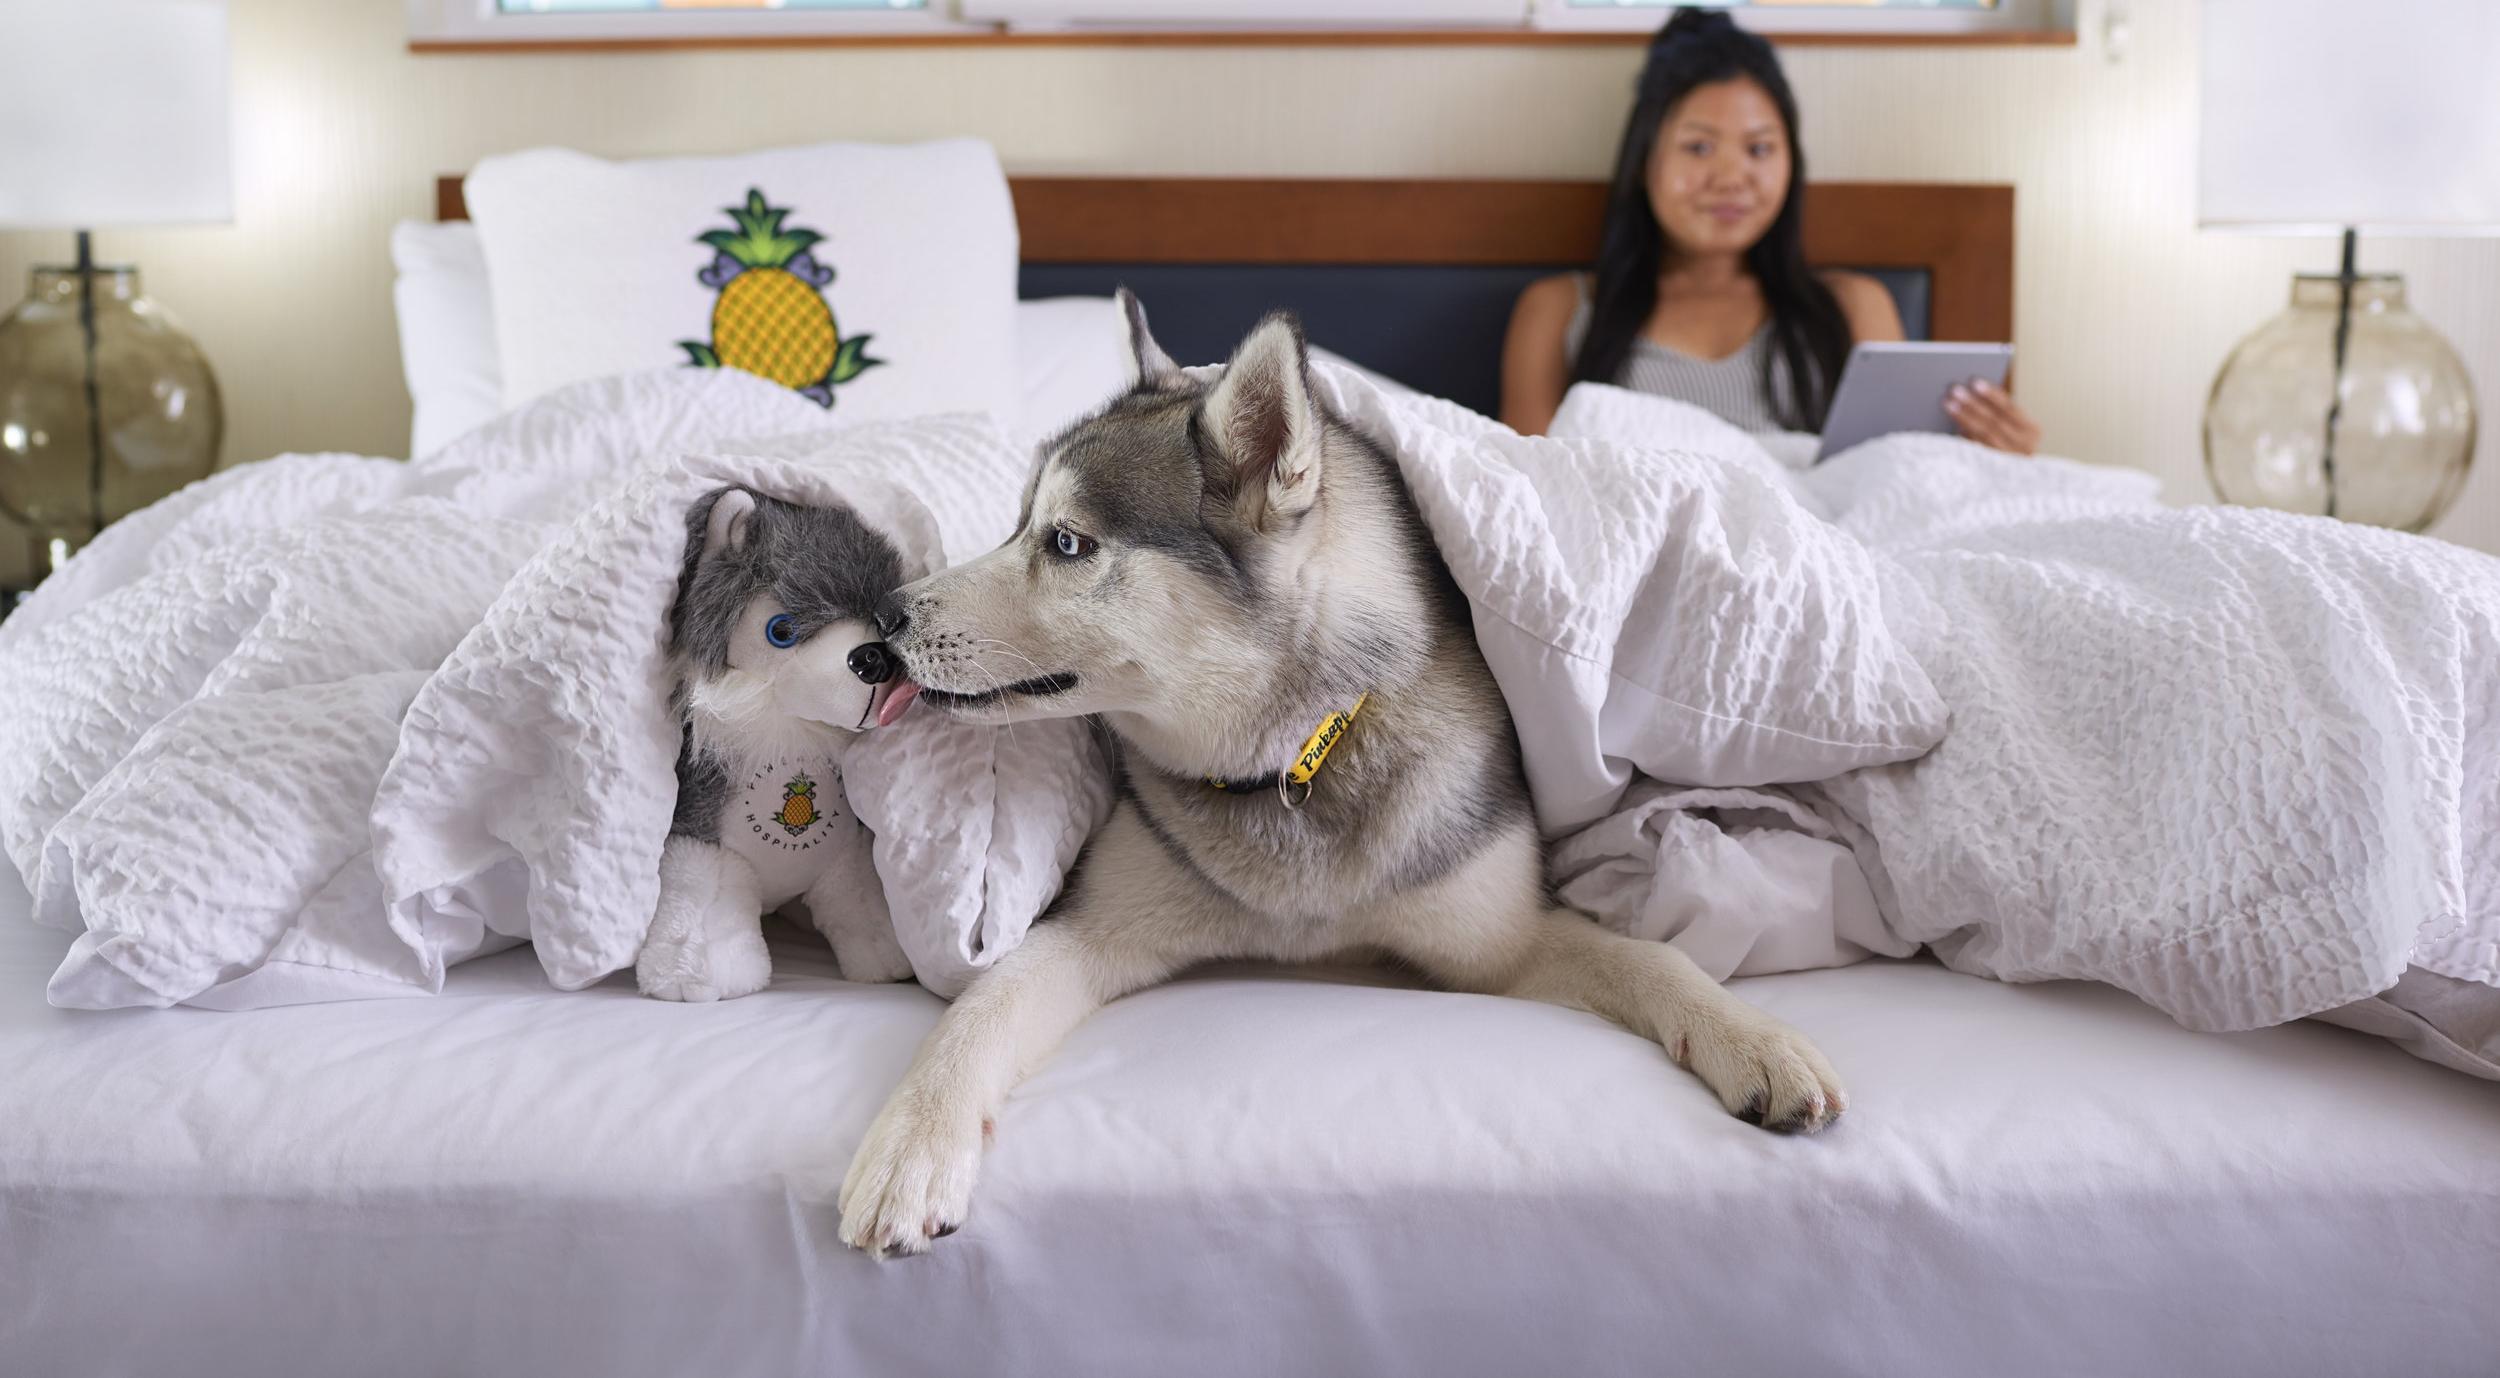 Lifestyle-2017-Girl-Dog-Husky-Room-Bed-DSC-0883